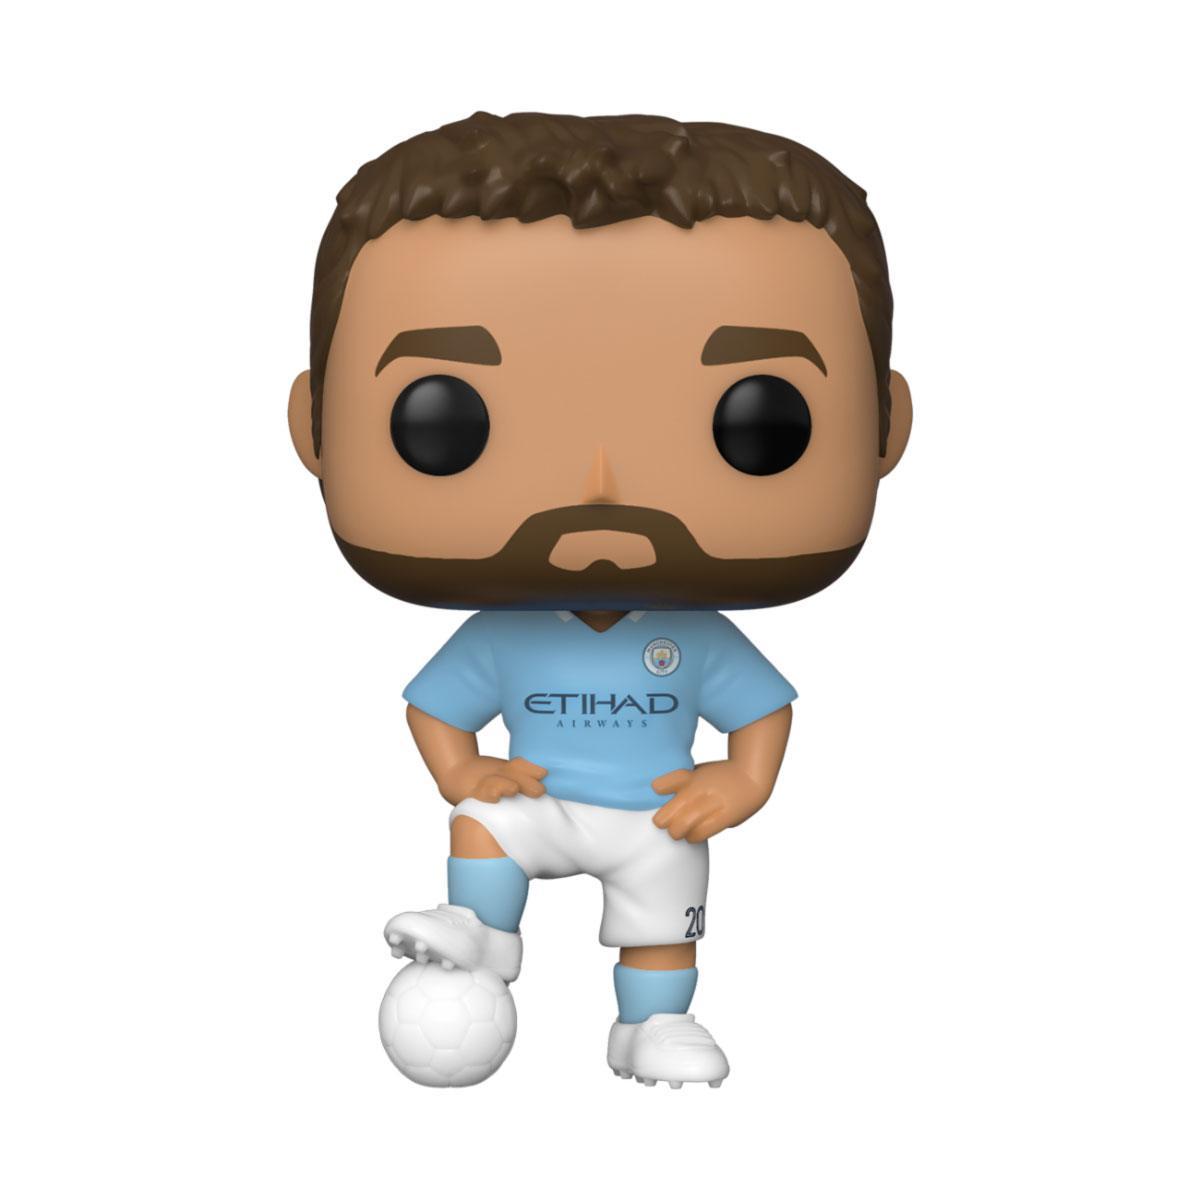 EPL POP! Football Vinyl Figure Bernardo Silva (Manchester City) 9 cm